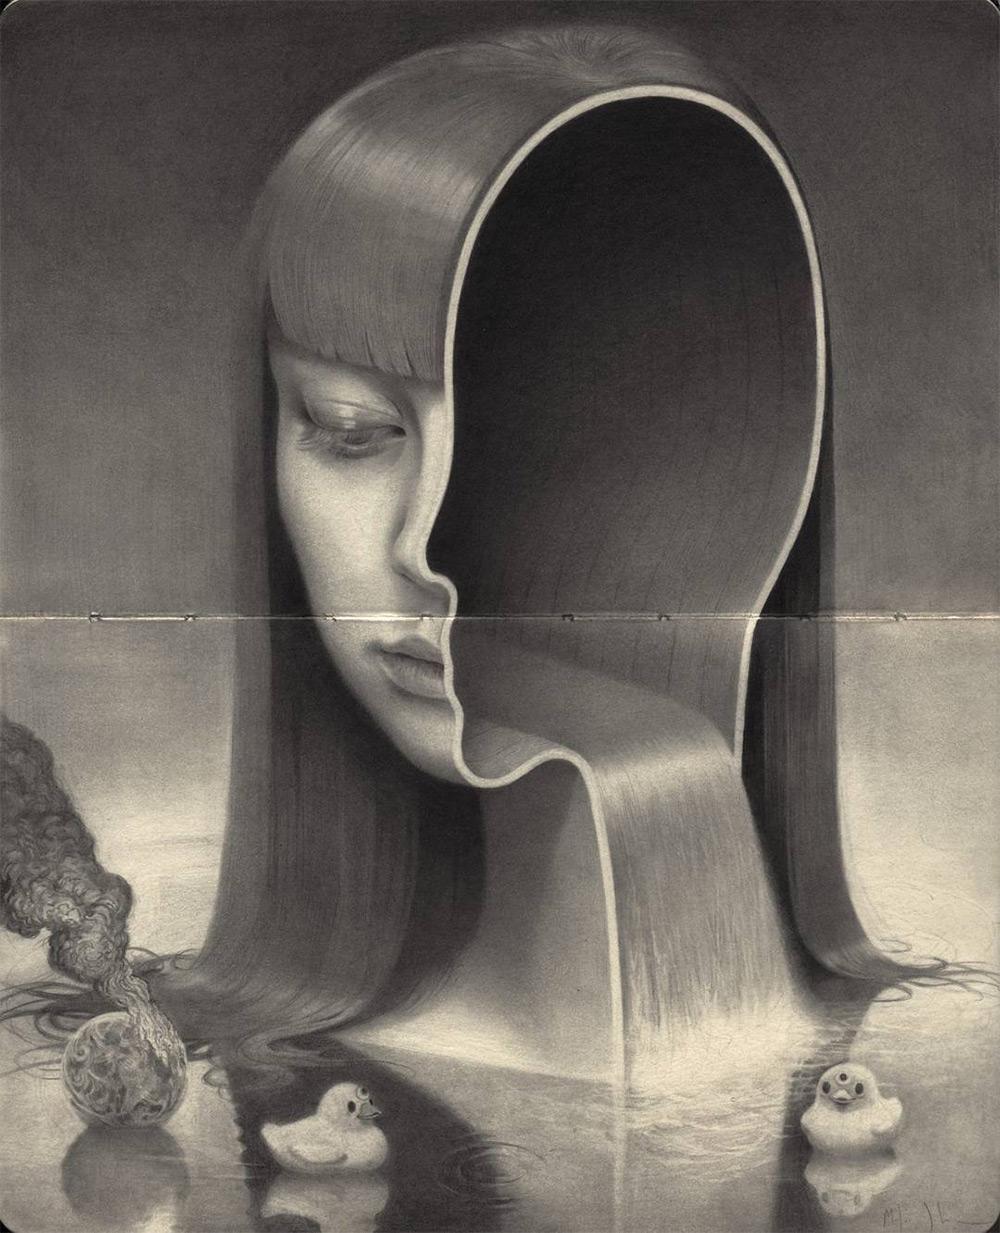 Deform, Divide, Attract, Recur - Transformations series by Miles Johnston